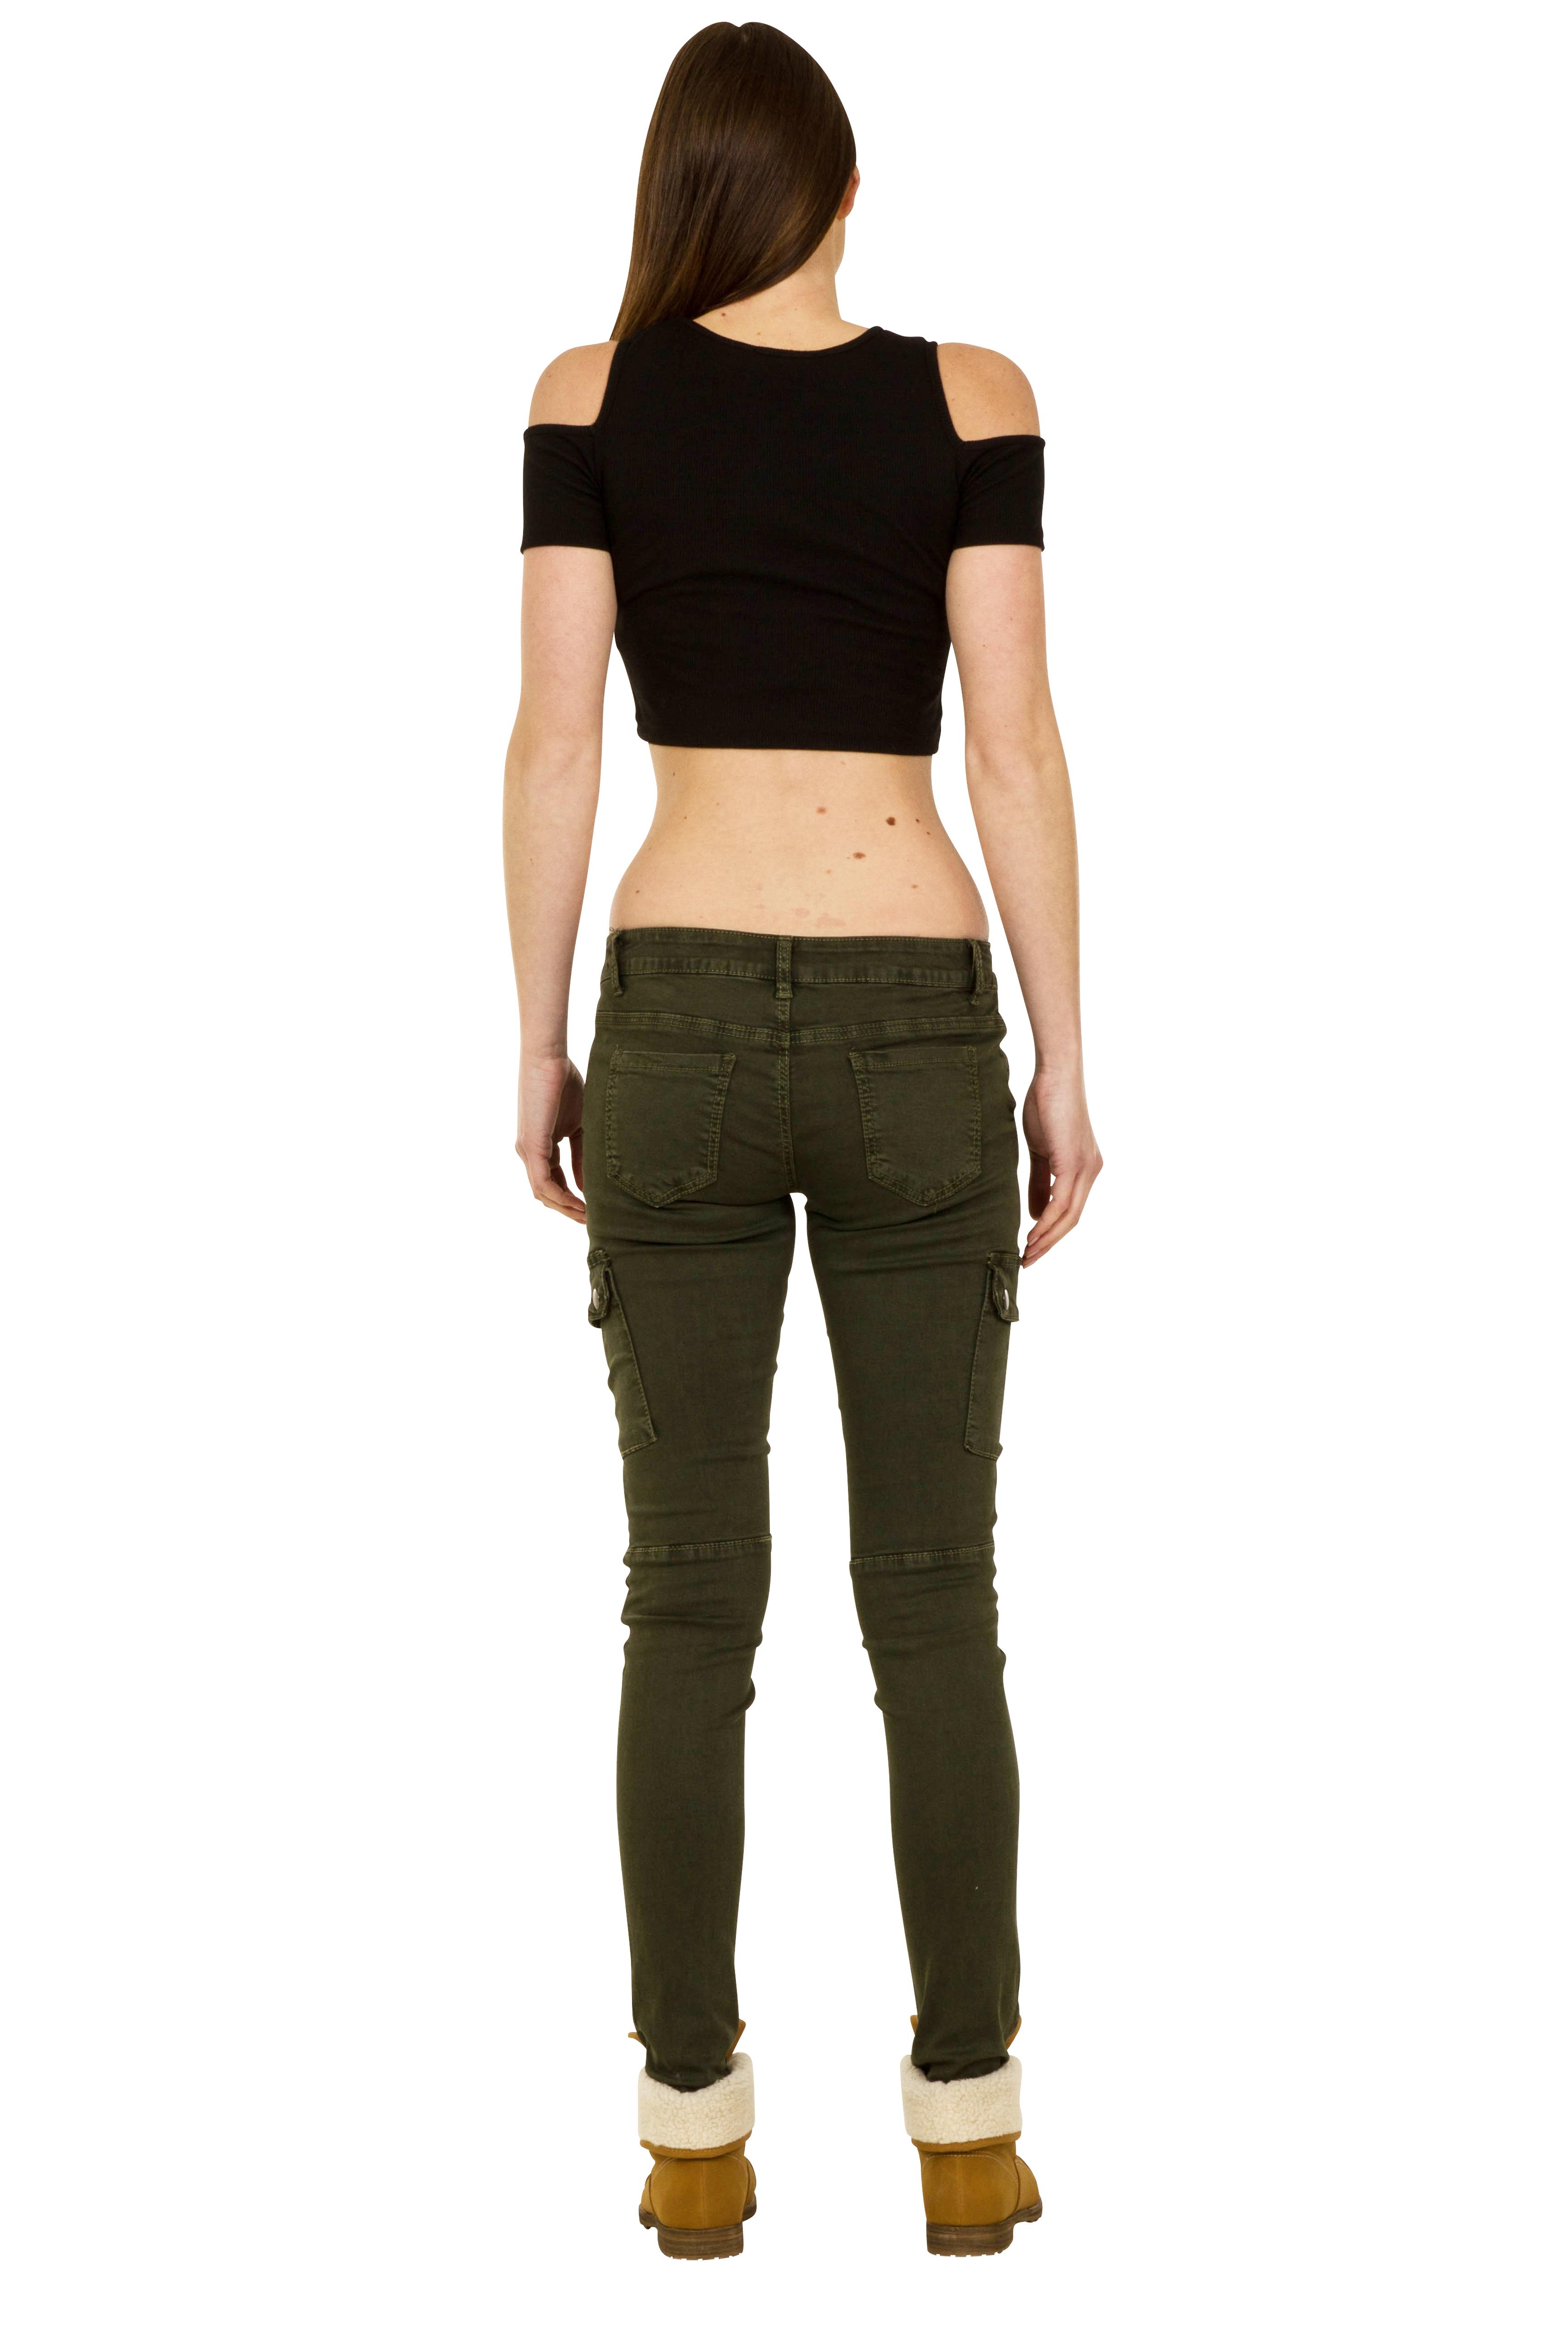 Fantastic Green Cargo Pants Skinny Pants Dark Blue Skinnies Grey Cargo Pants